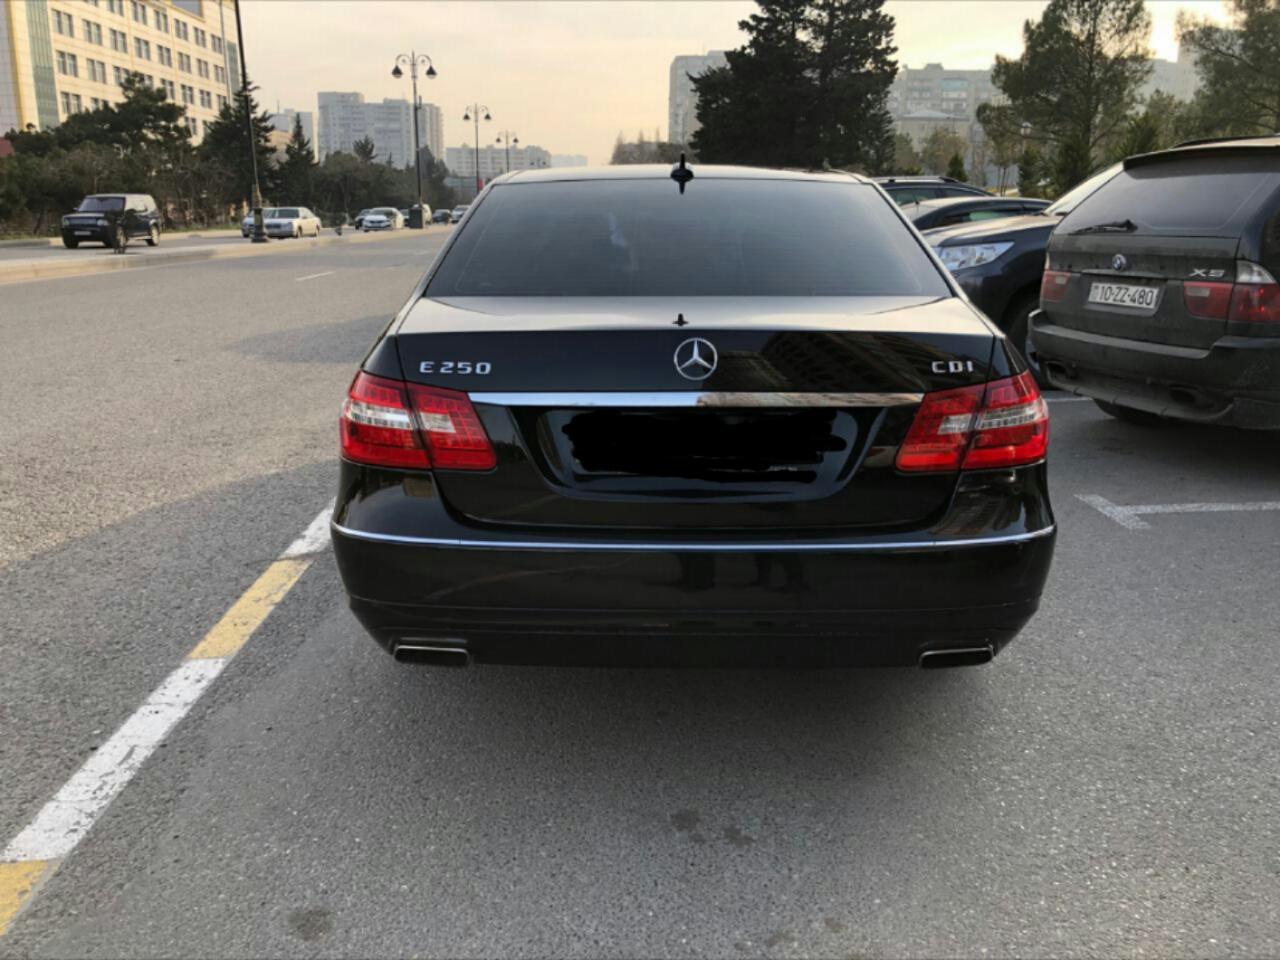 Mercedes-Benz E 250 2.2(lt) 2012 İkinci əl  $23000